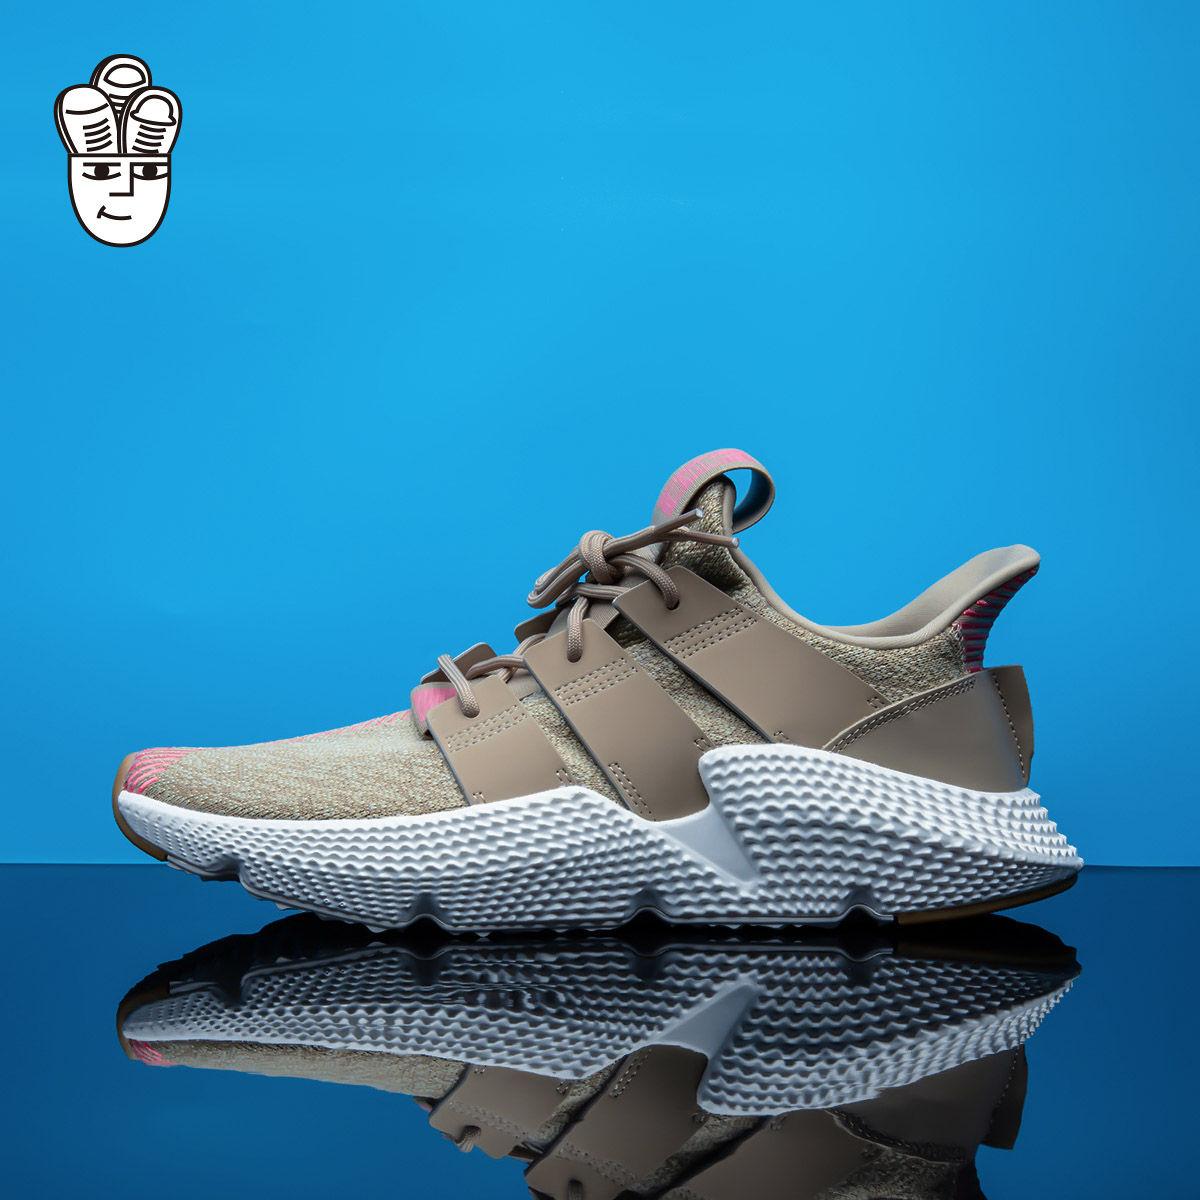 Adidas Prophere 阿迪达斯男鞋 爆米花复古跑鞋 运动休闲鞋